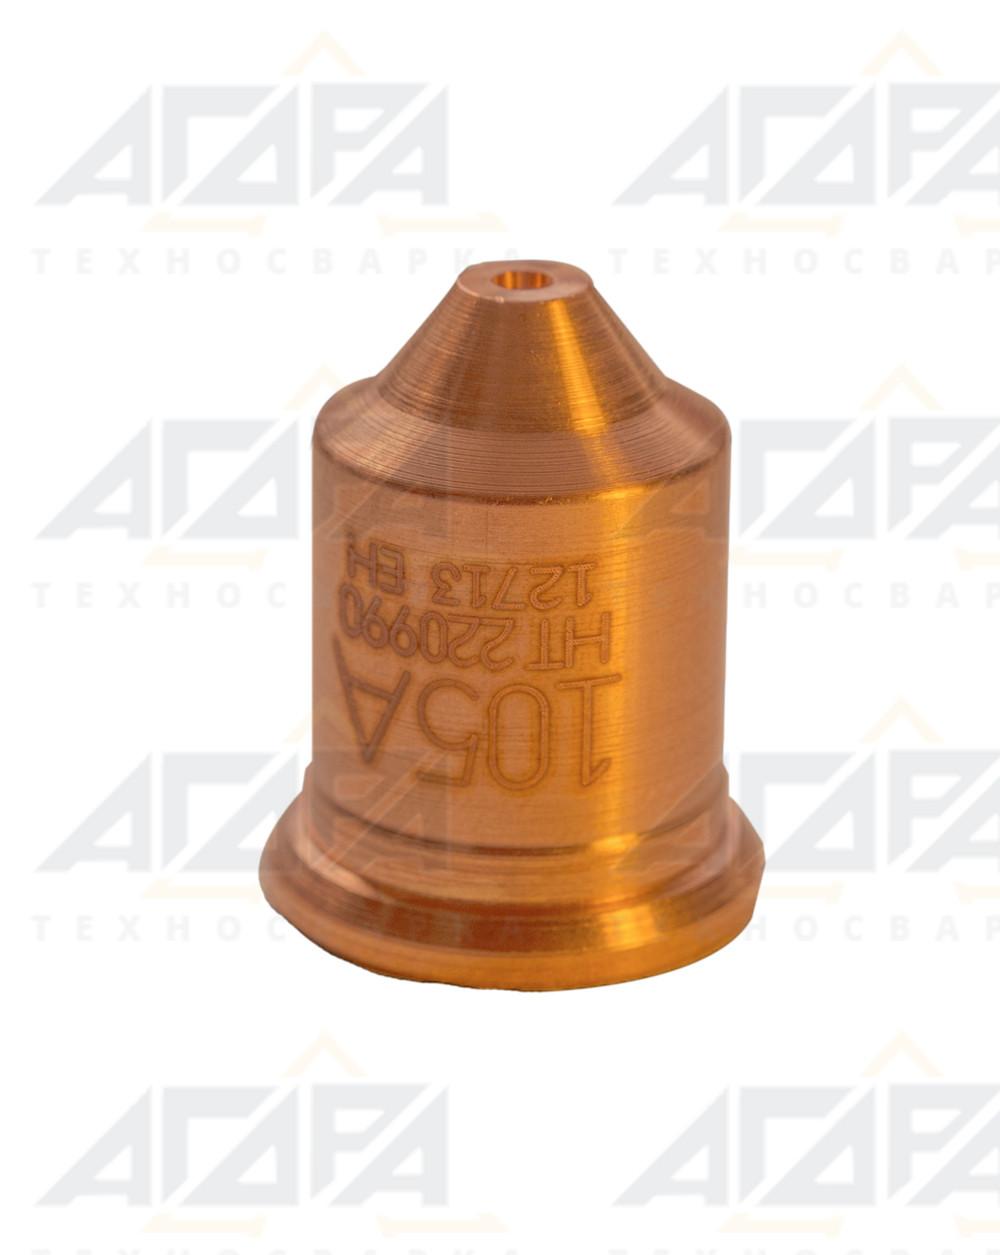 Сопло/Nozzle 220990 105 А для Hypertherm Powermax 65 Hypertherm Powermax 85 Powermax 105 оригинал (OEM)